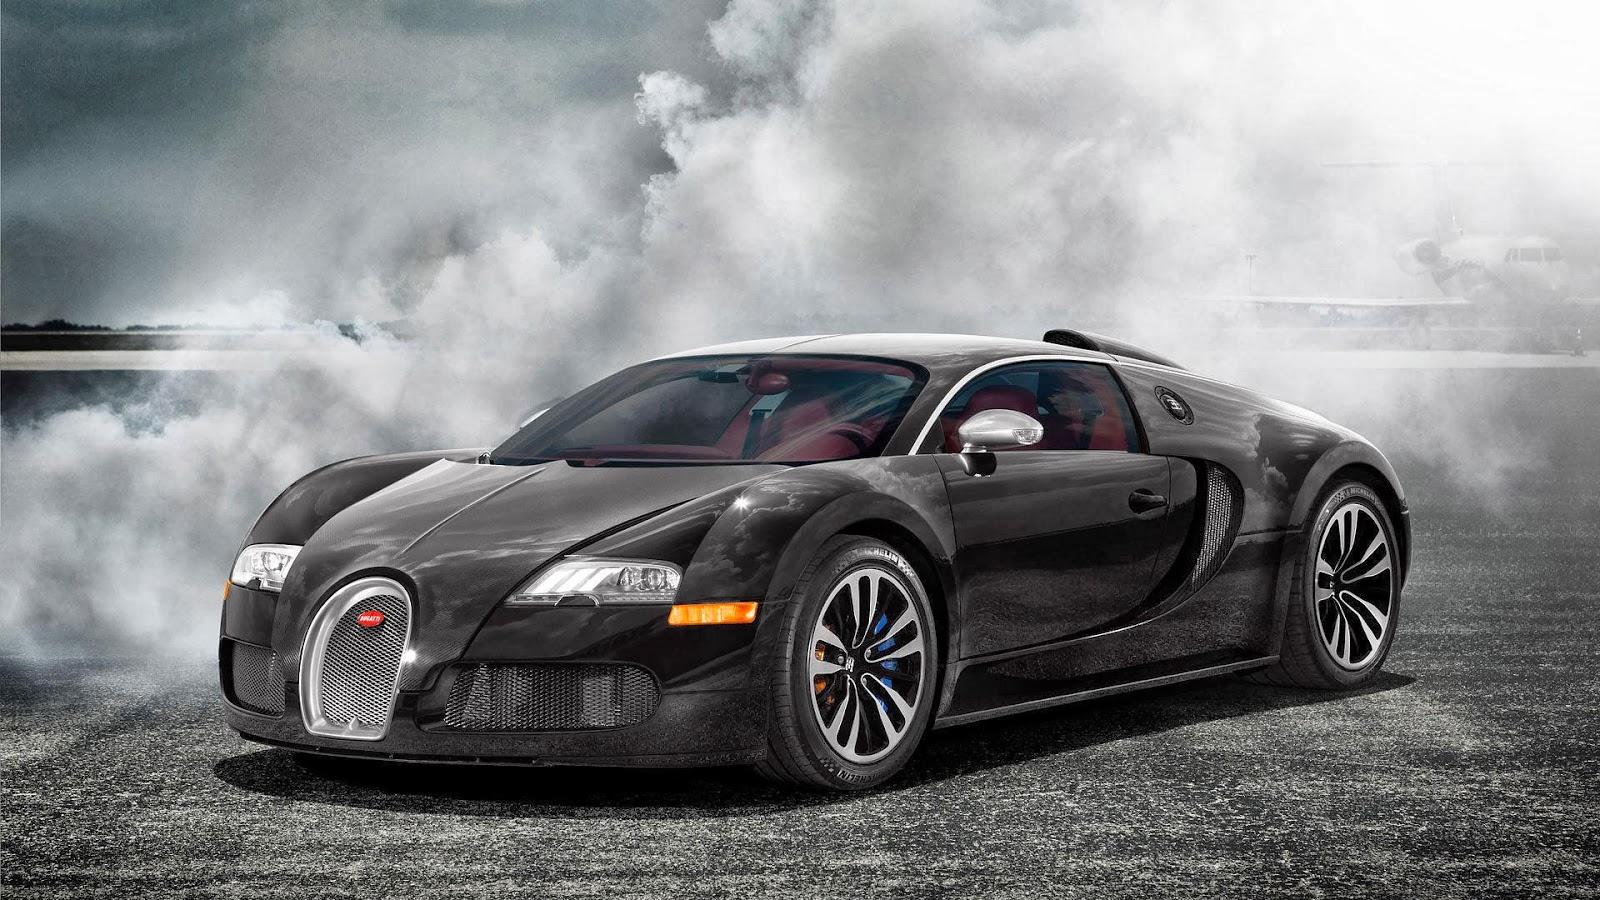 Bugatti Veyron Super Sport 2013 Wallpaper Hd In Black: Bugatti Veyron 2013 Sports Cars HD